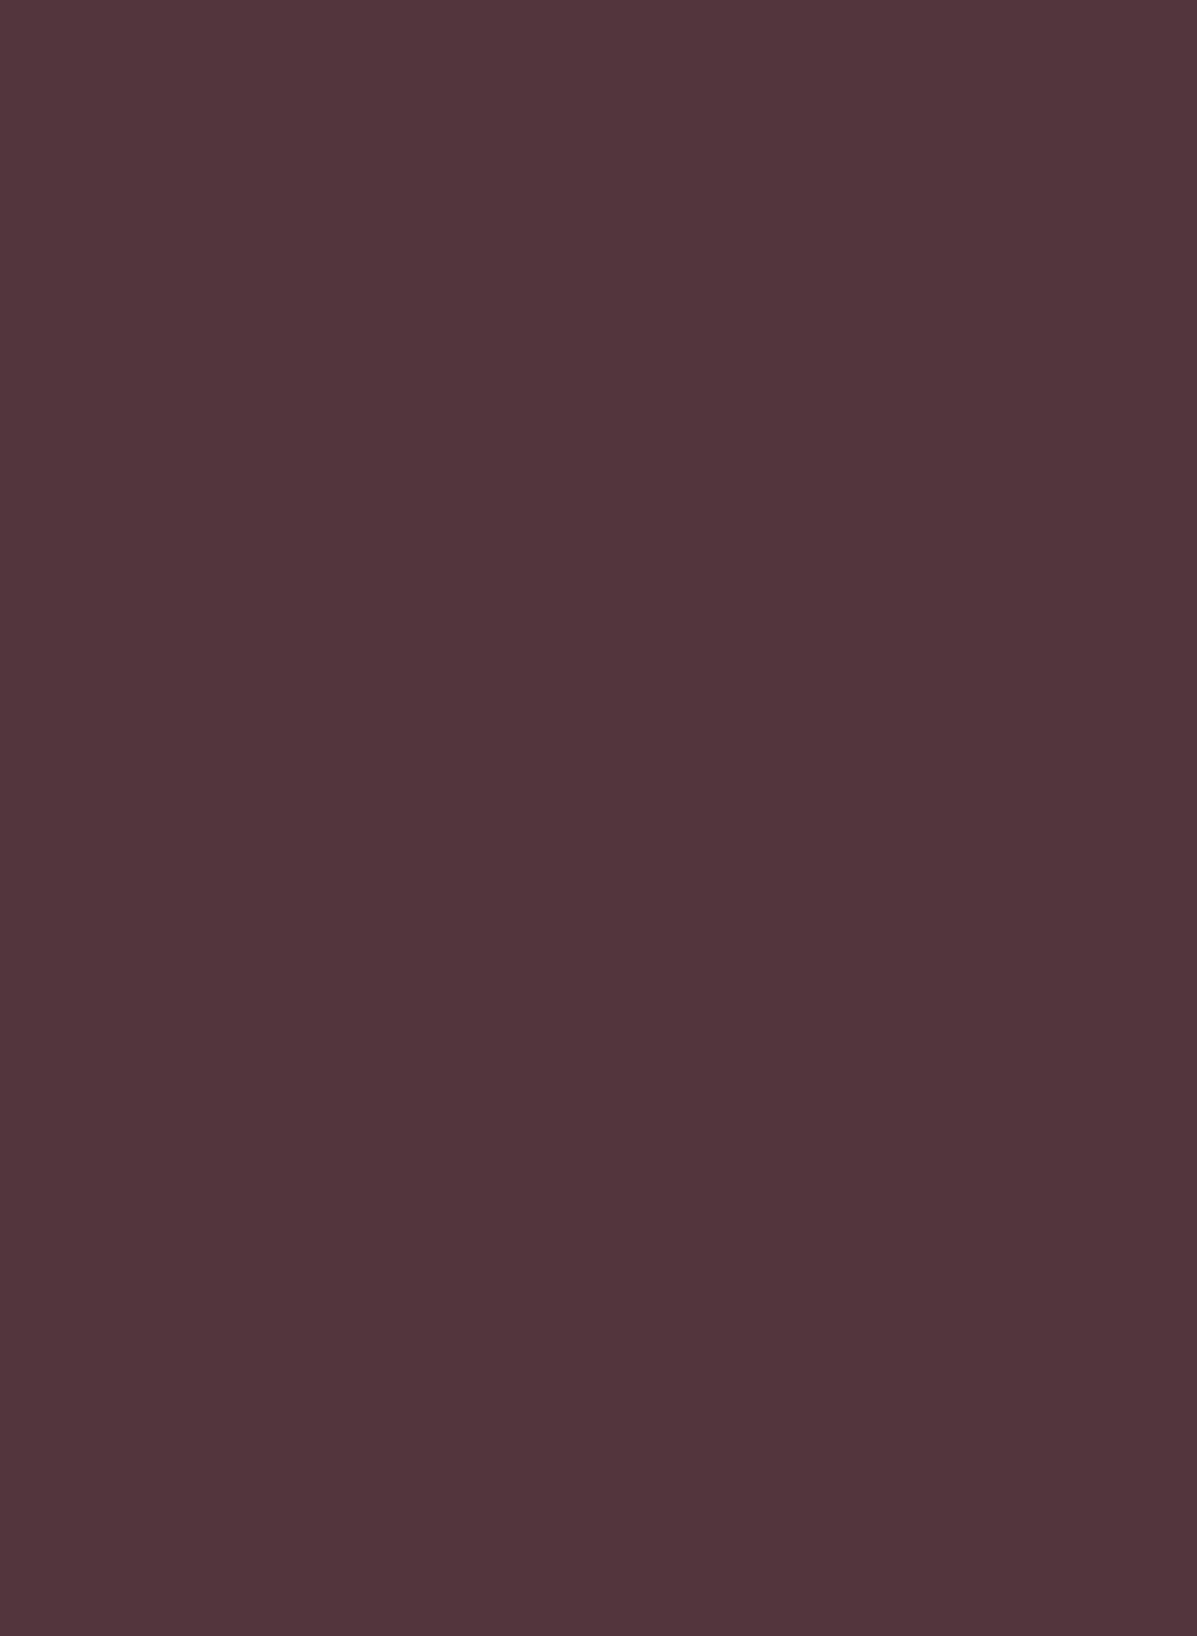 333-01 Cérise noir.jpg